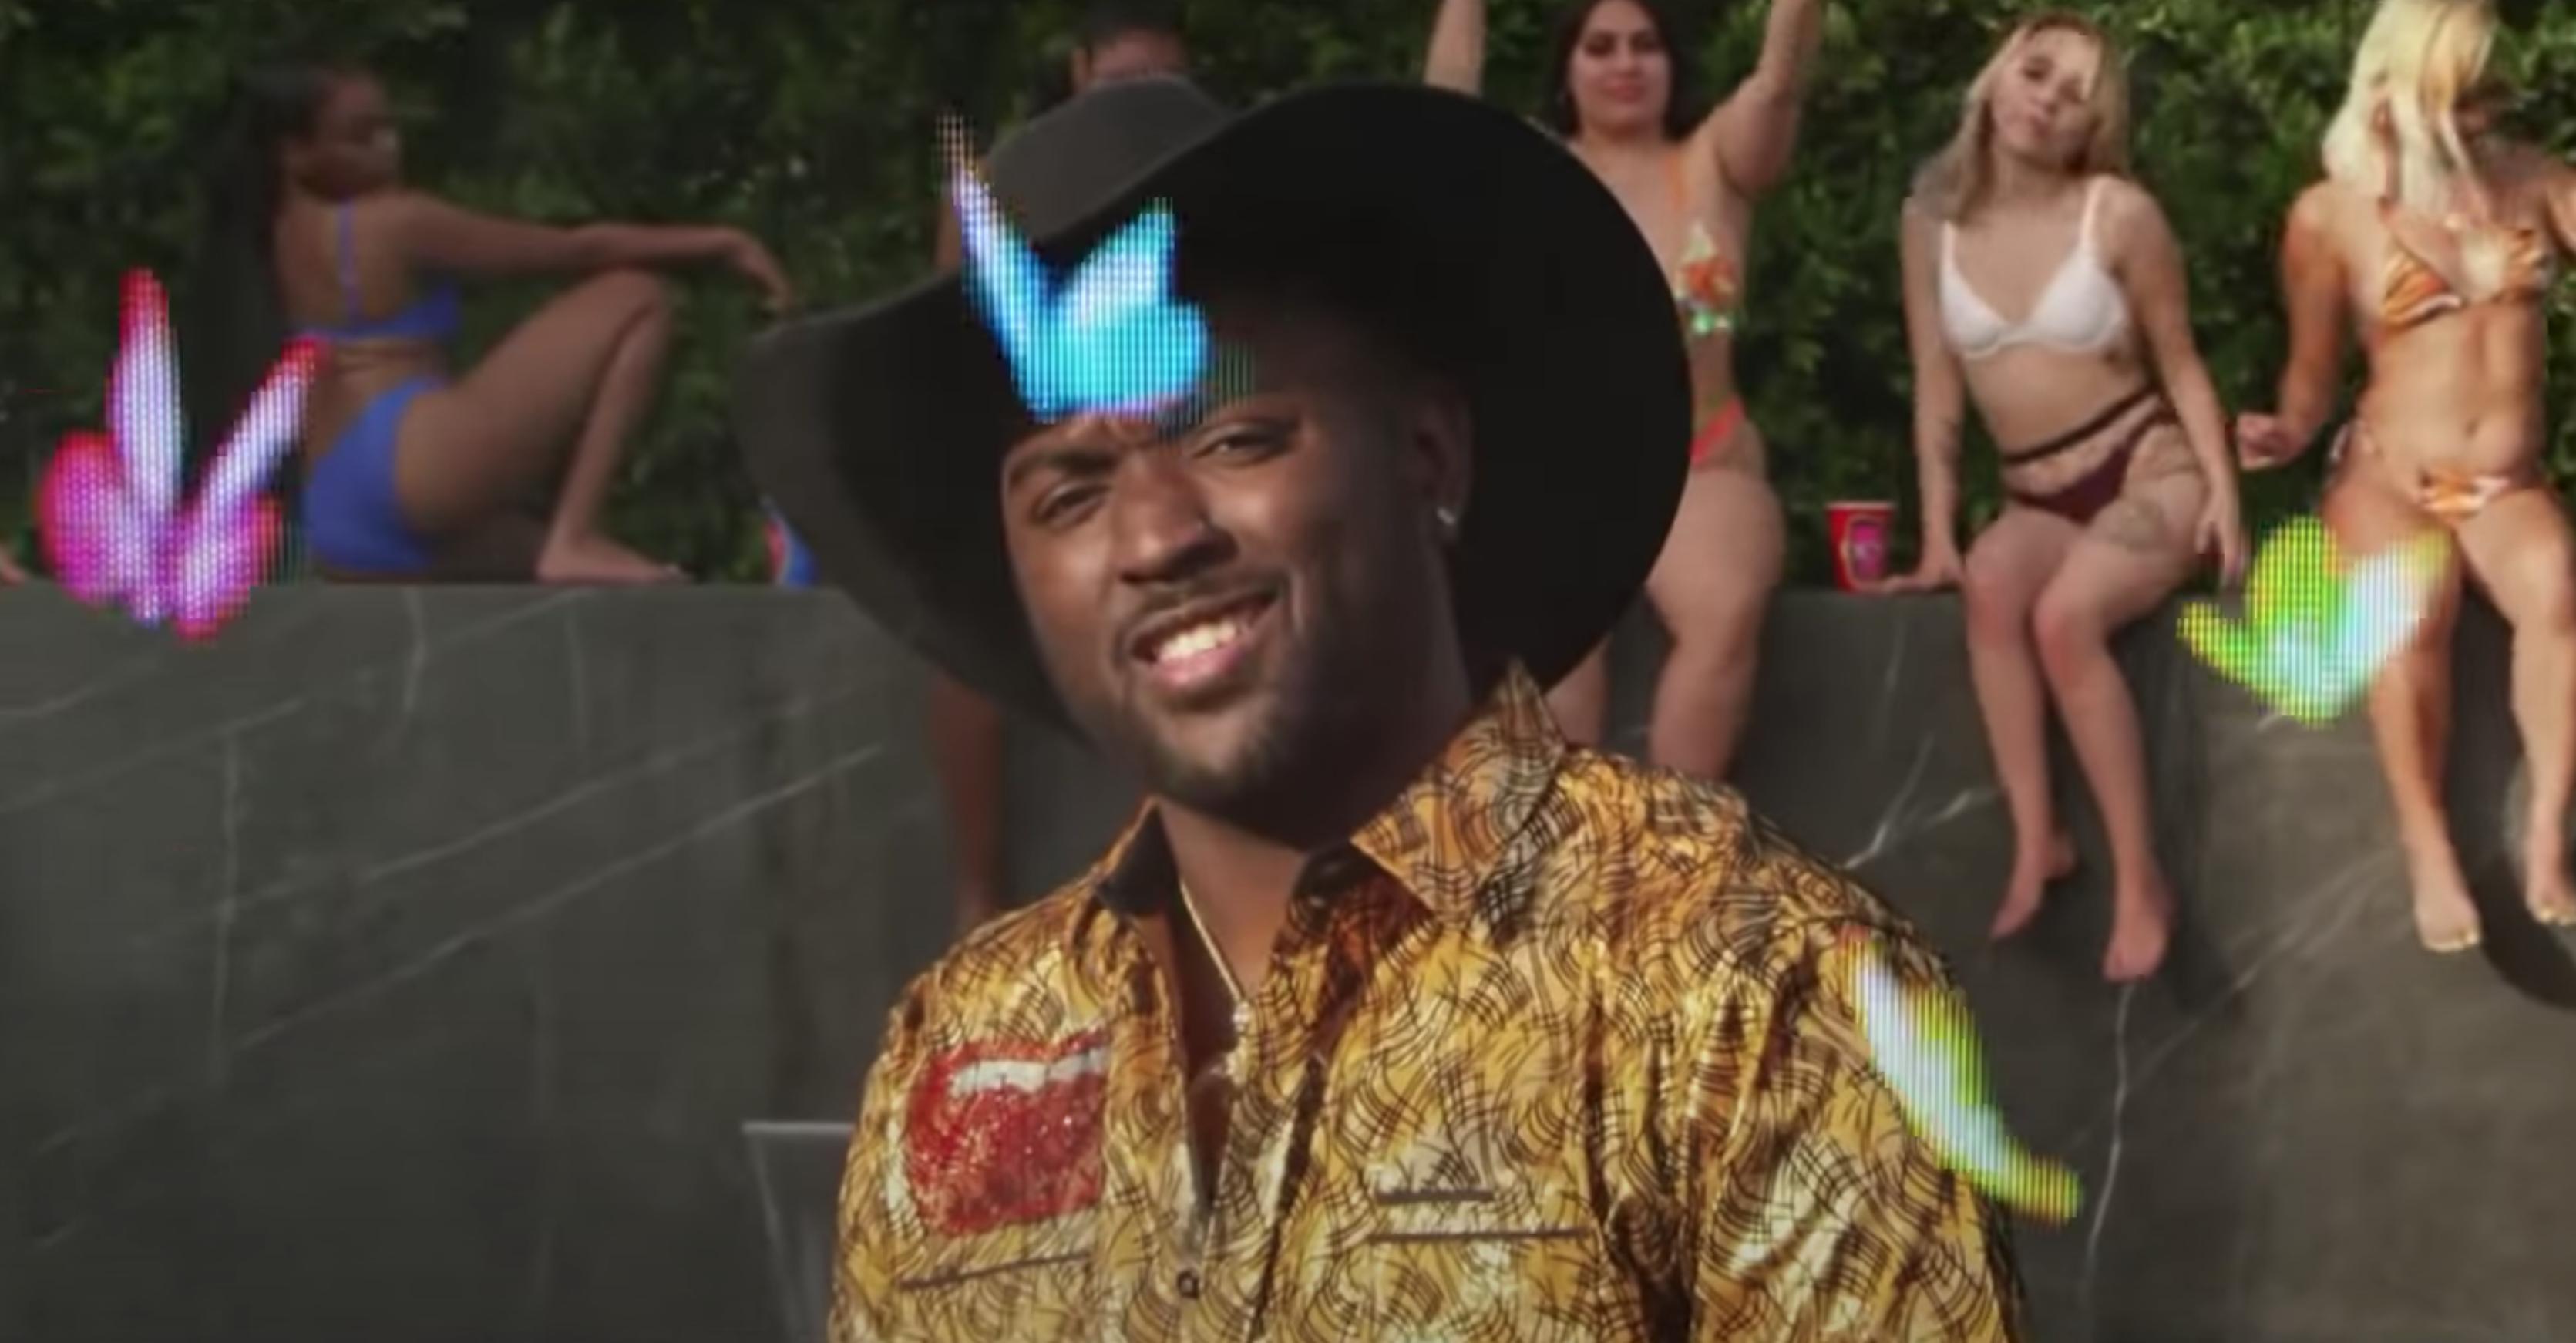 DeVon True Pours Up The Casa Migos In 'Margarita' Video